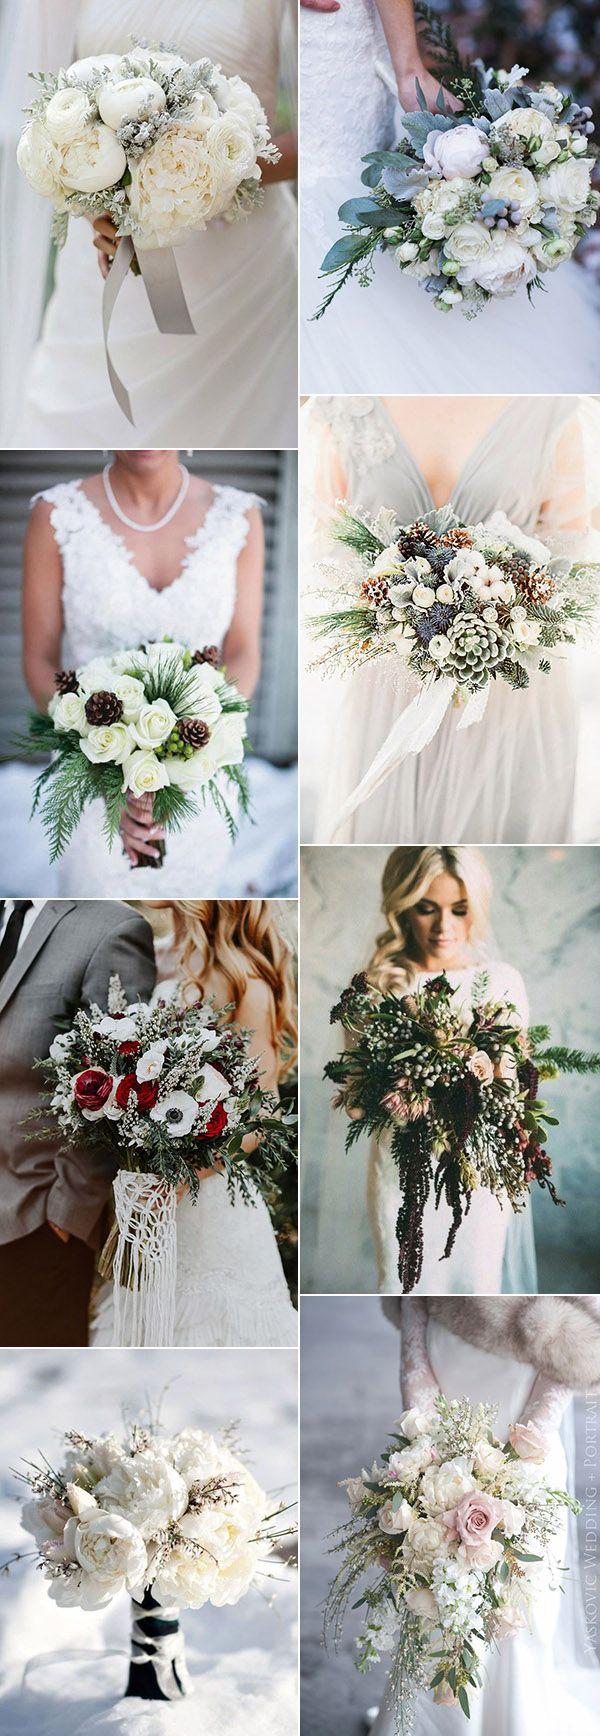 wedding bouquets for winter wedding ideas